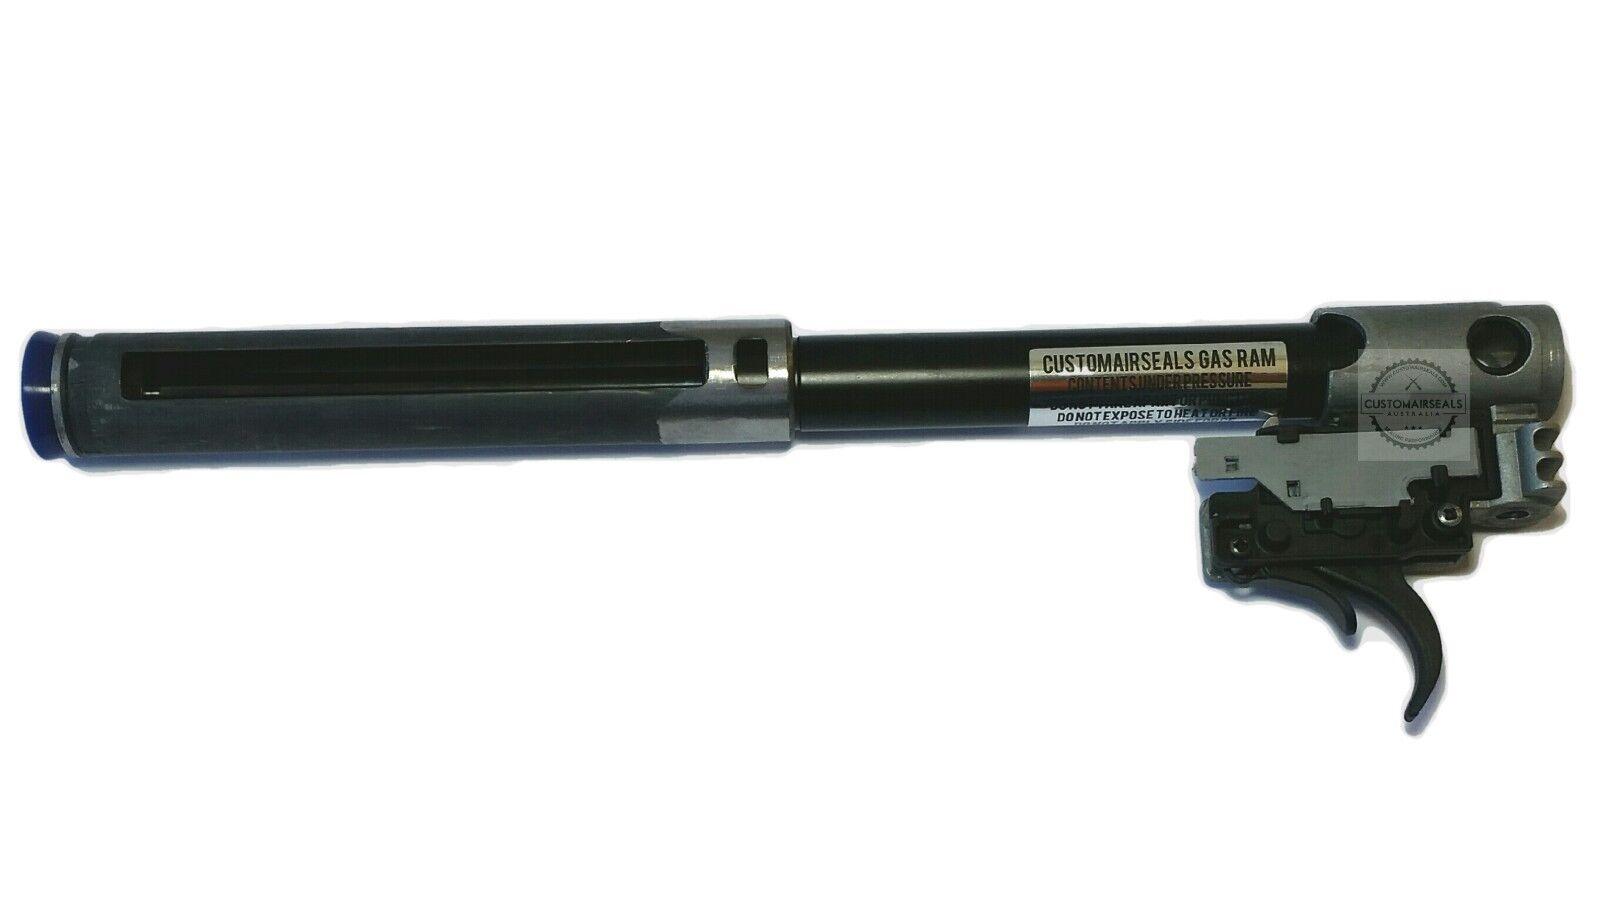 Details about GAMO GAS RAM NITRO PISTON KIT ATS SAT PLASTIC TRIGGER AIR  RIFLE SPRING ATS-RAM